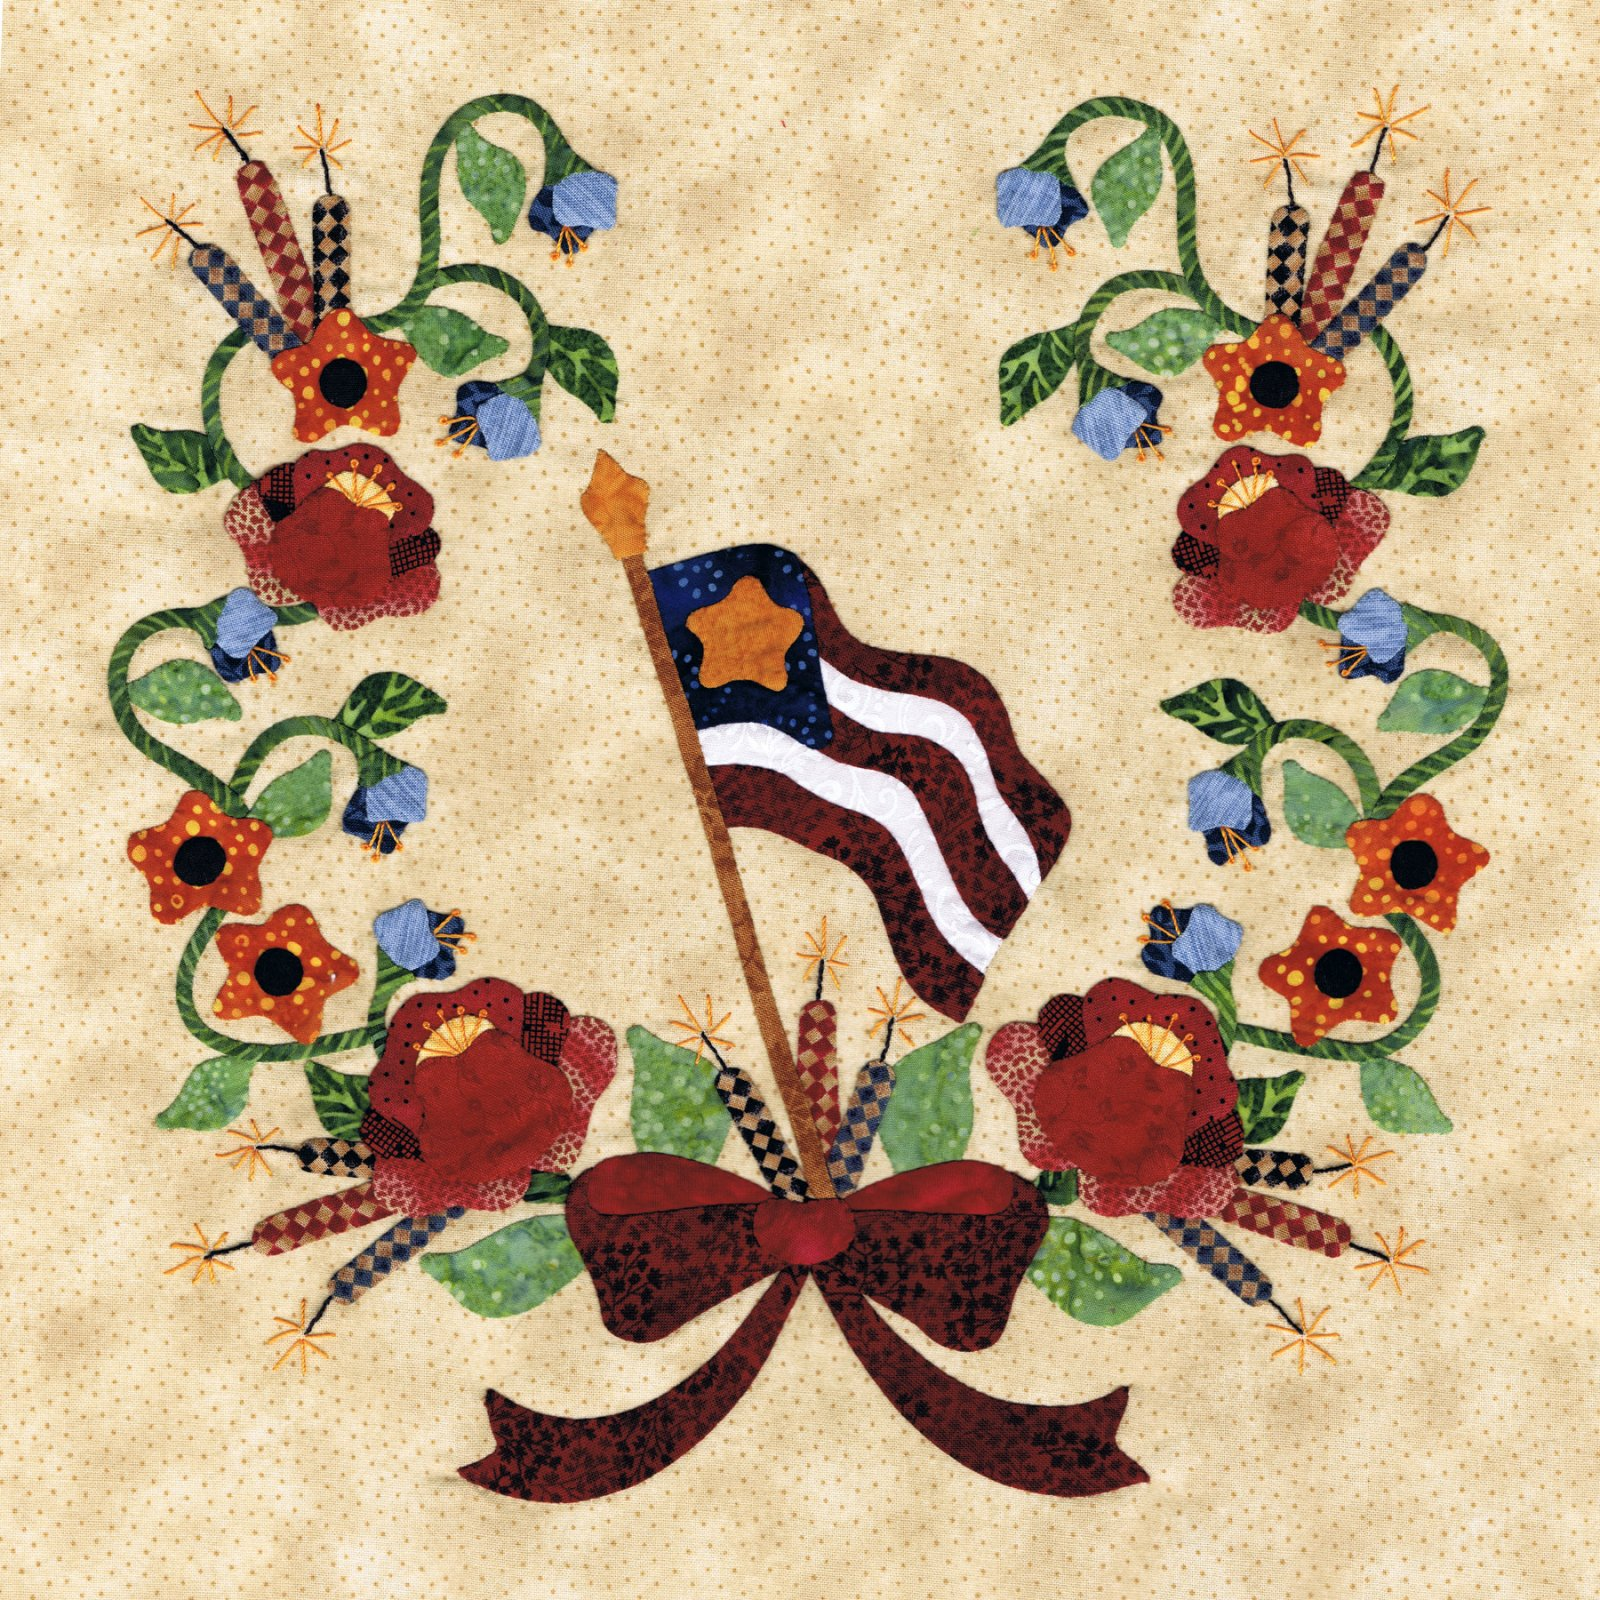 P3-1701 Holiday Wreath